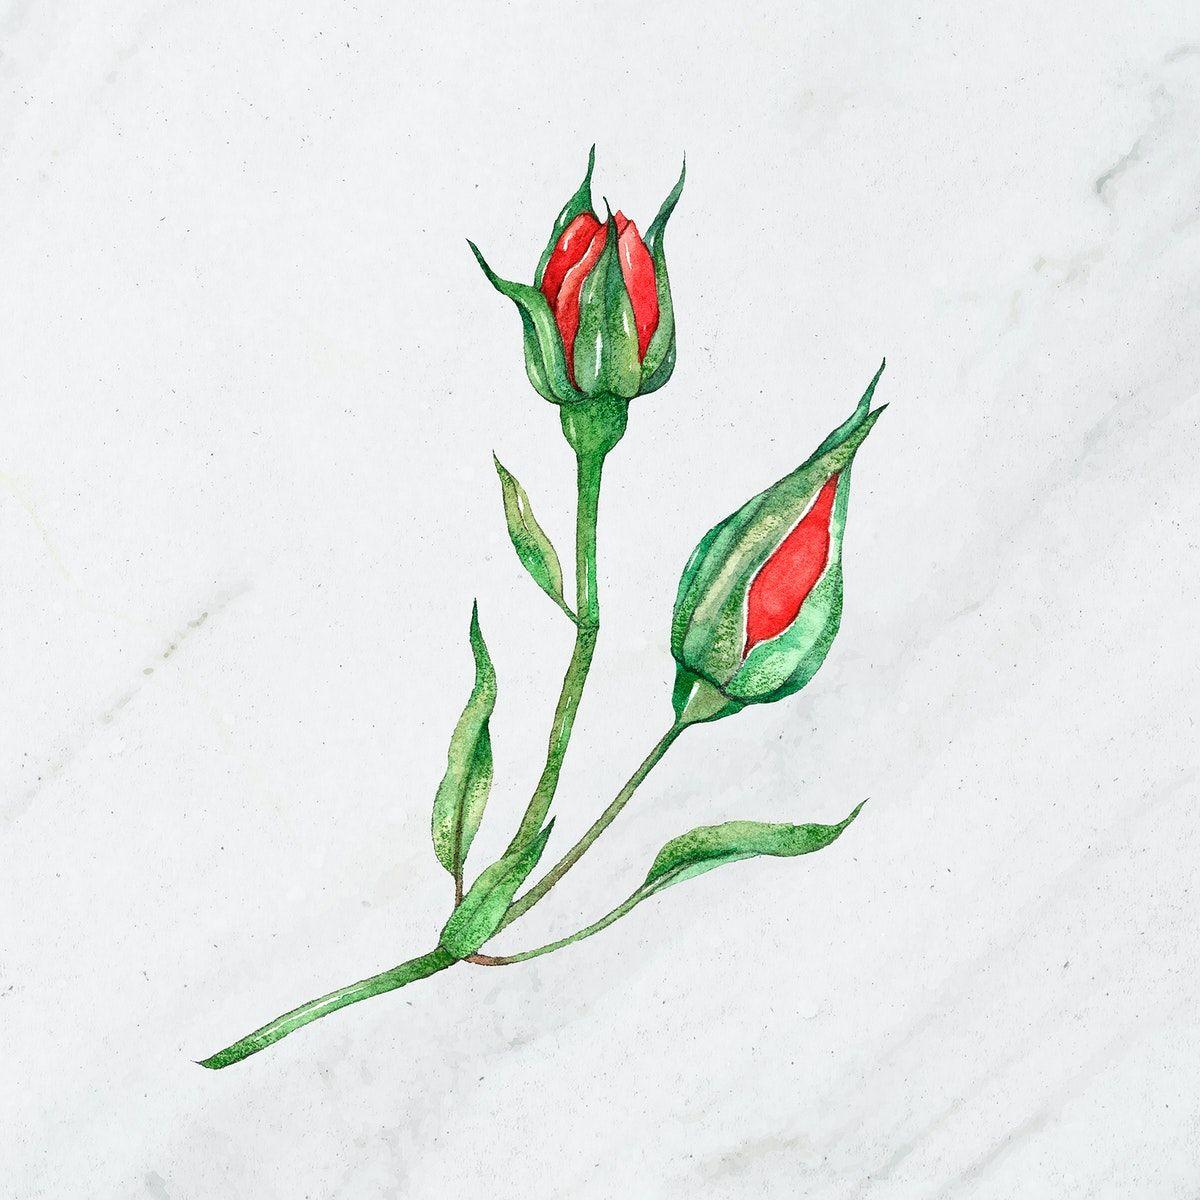 Rose outline free download clip art on clipart jpg - Clipartix